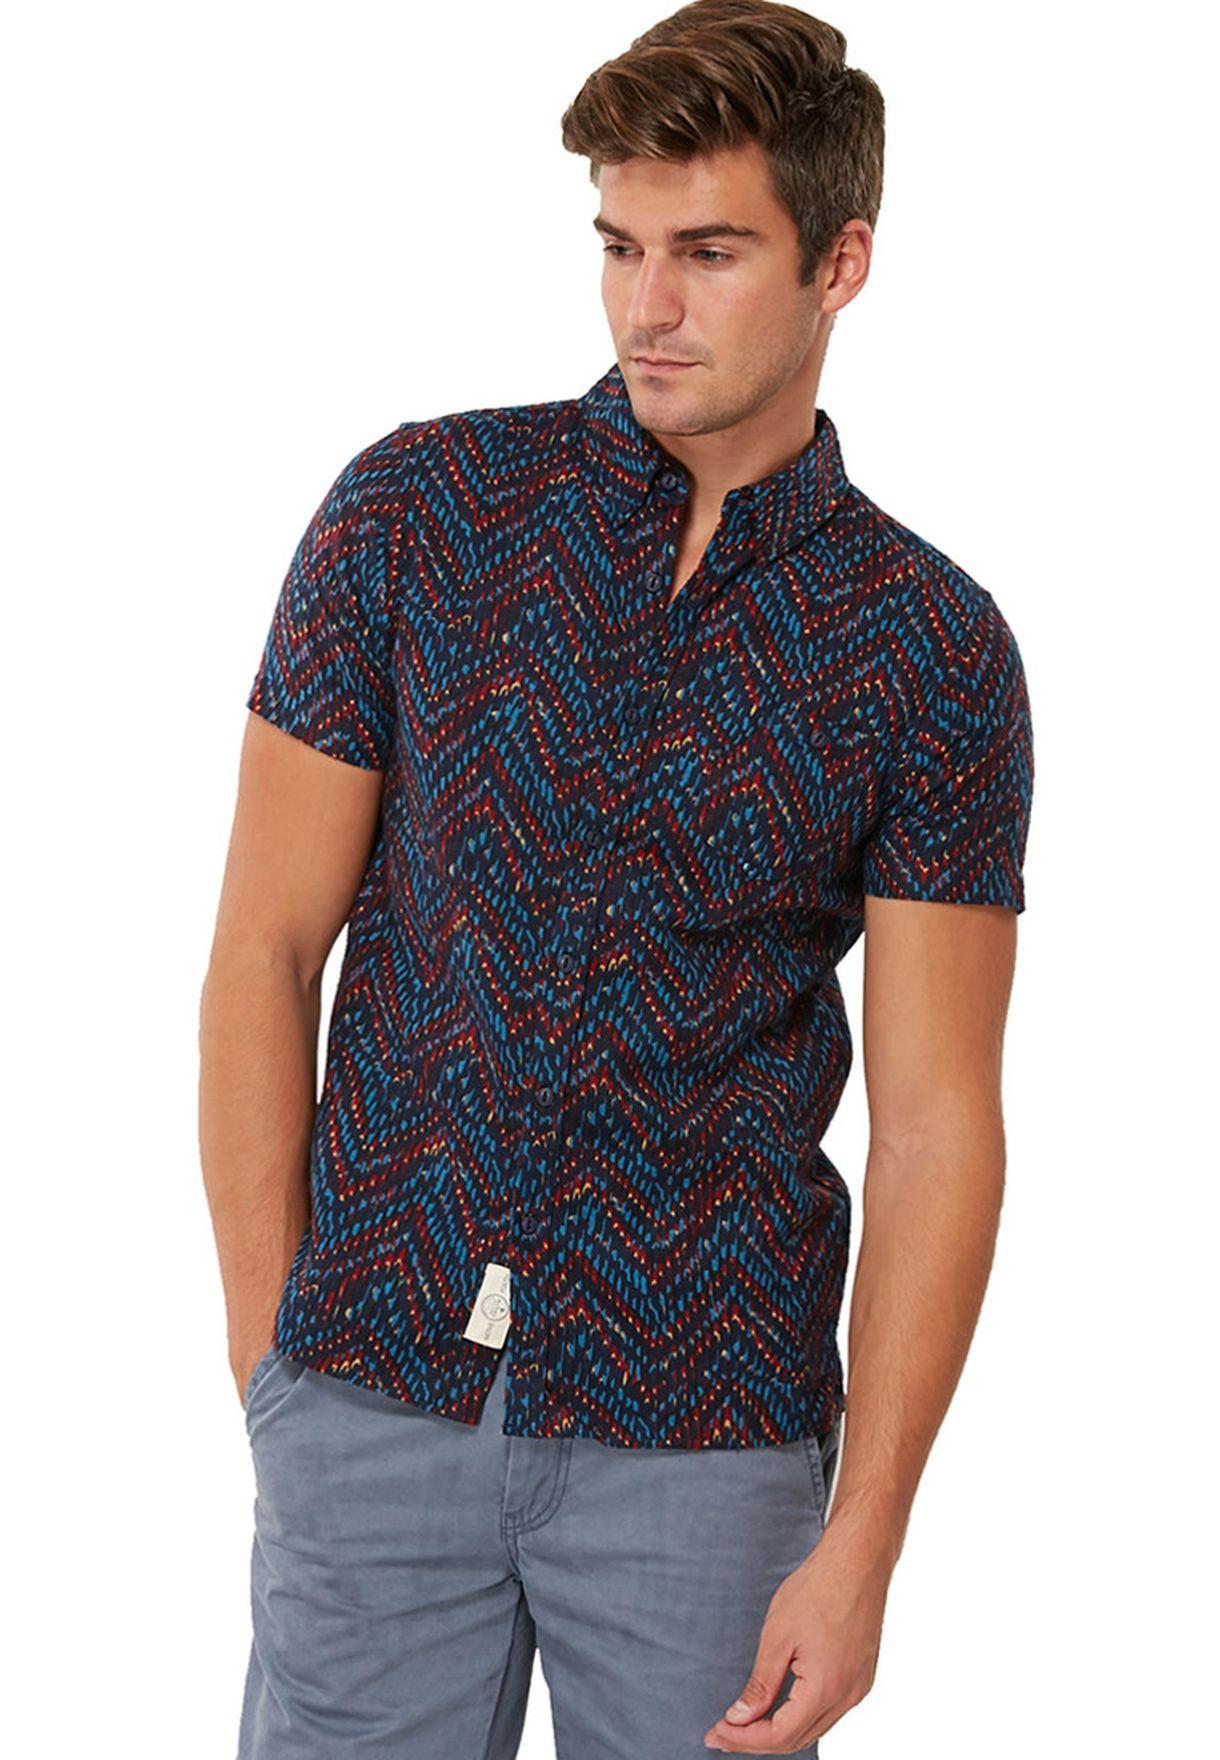 61bdcf37f3b Shop Native youth prints Herringbone Print Shirt for Men in Bahrain -  NA557AT18PYN